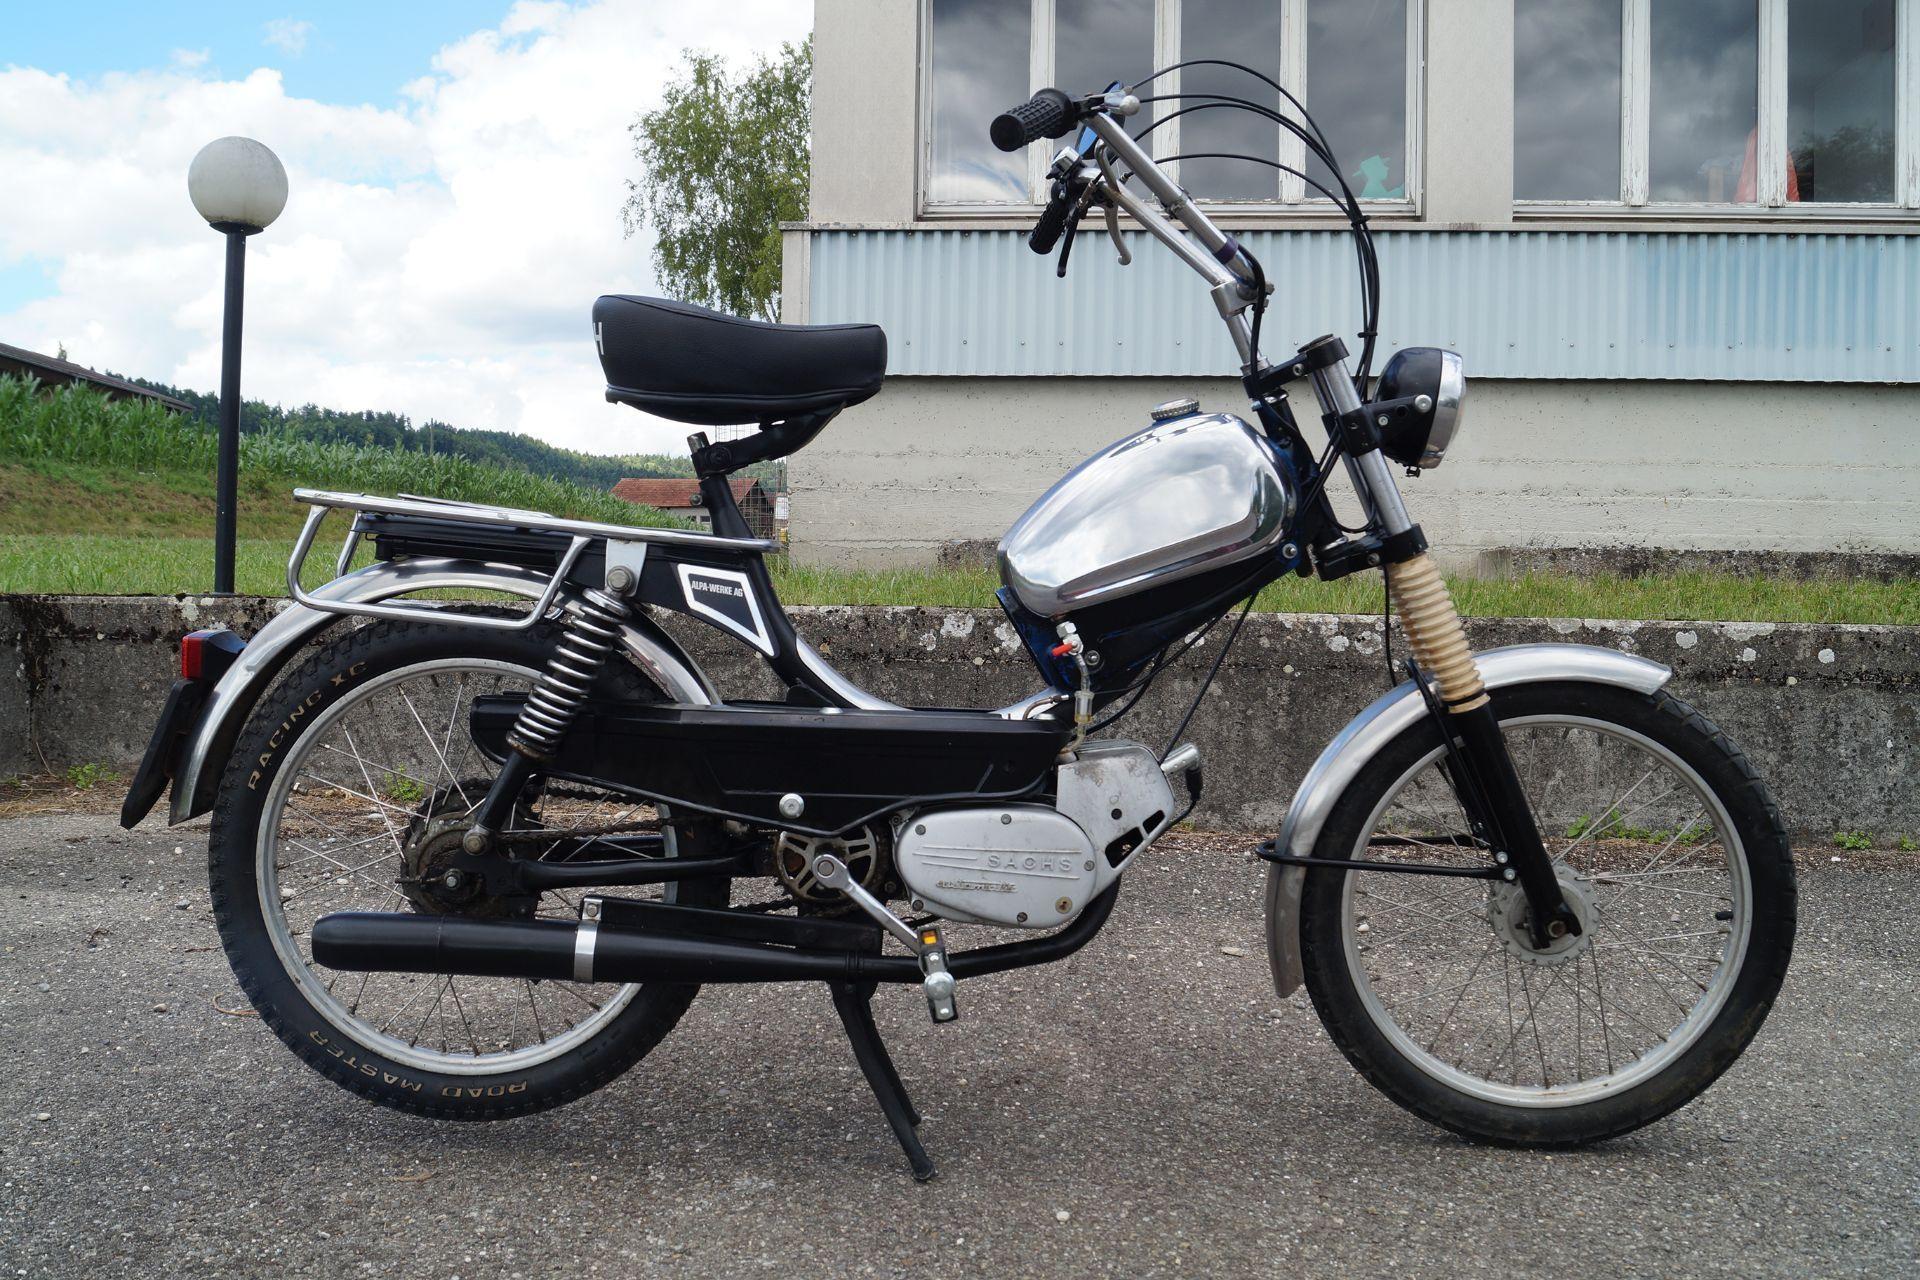 motorrad occasion kaufen sachs mofa alfa 503 motoshop. Black Bedroom Furniture Sets. Home Design Ideas